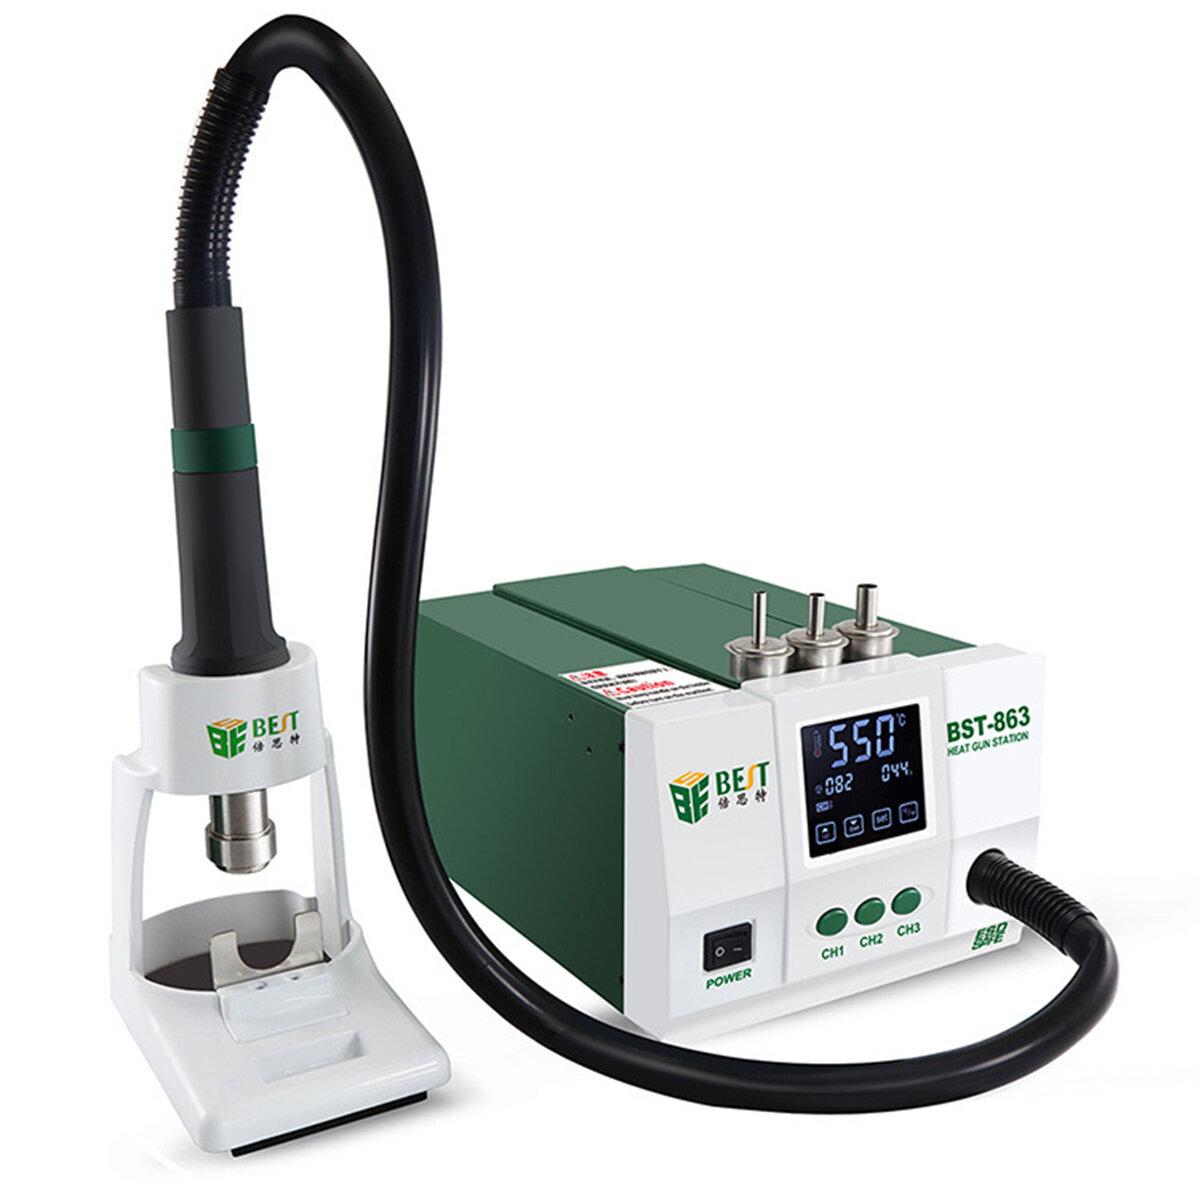 MEJOR BST-863 1200W 220V / 110V Inteligente LCD Pantalla táctil Estación de retrabajo SMD Heat Air